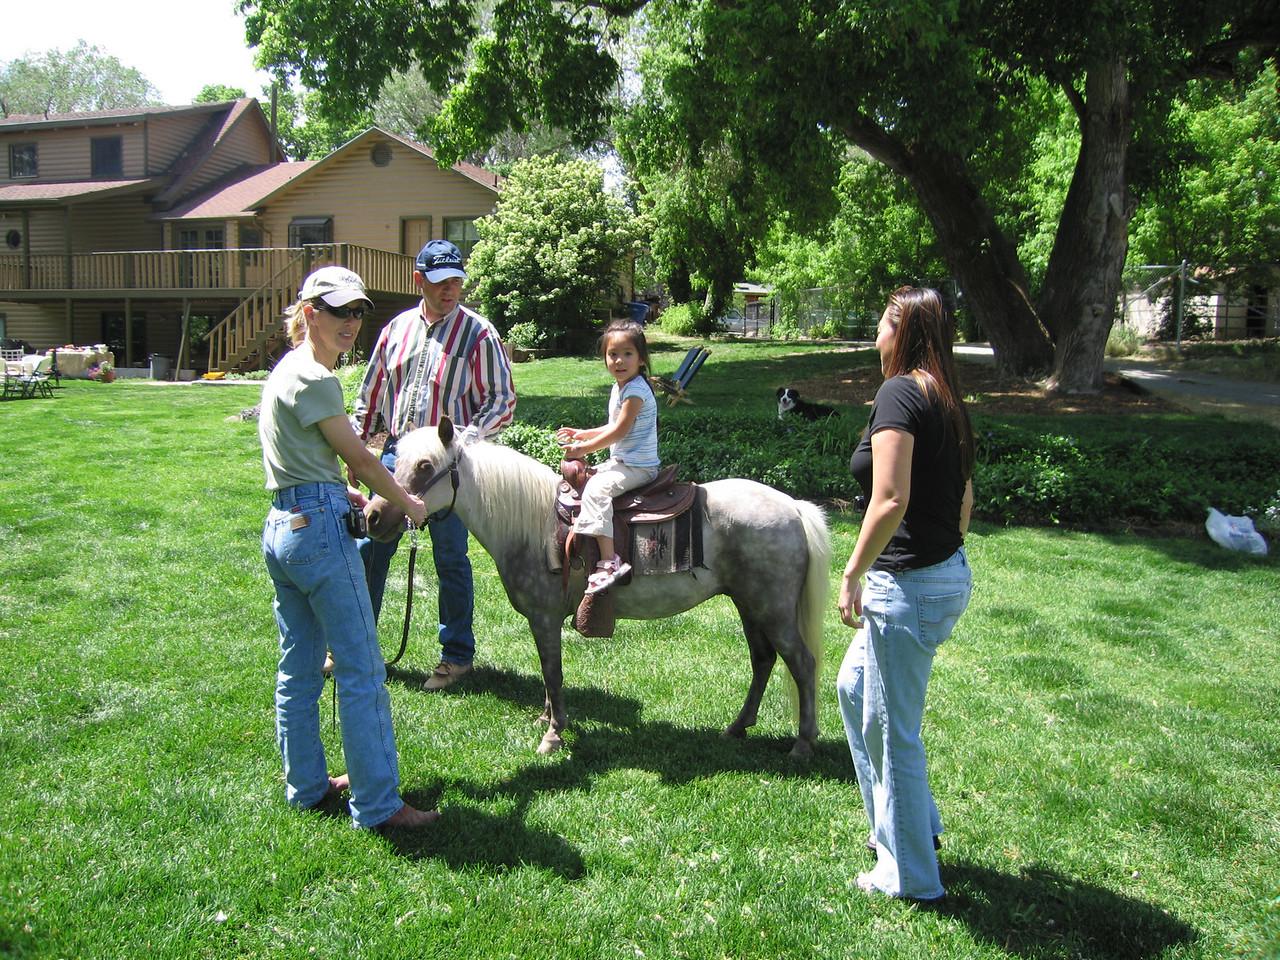 Jocelyn on the pony